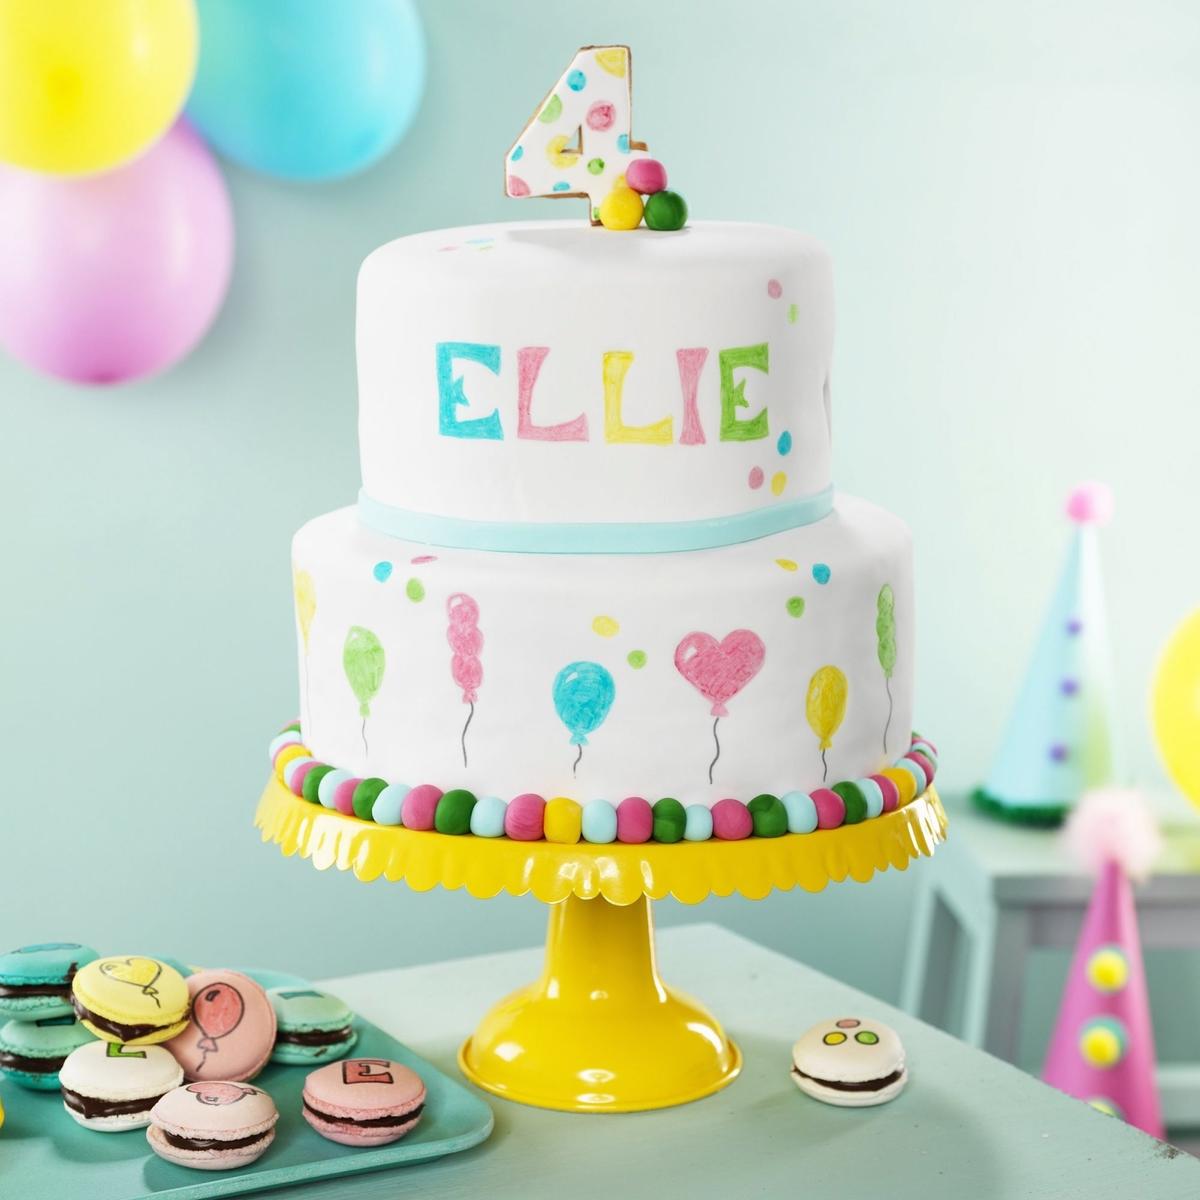 Rita på tårtan!